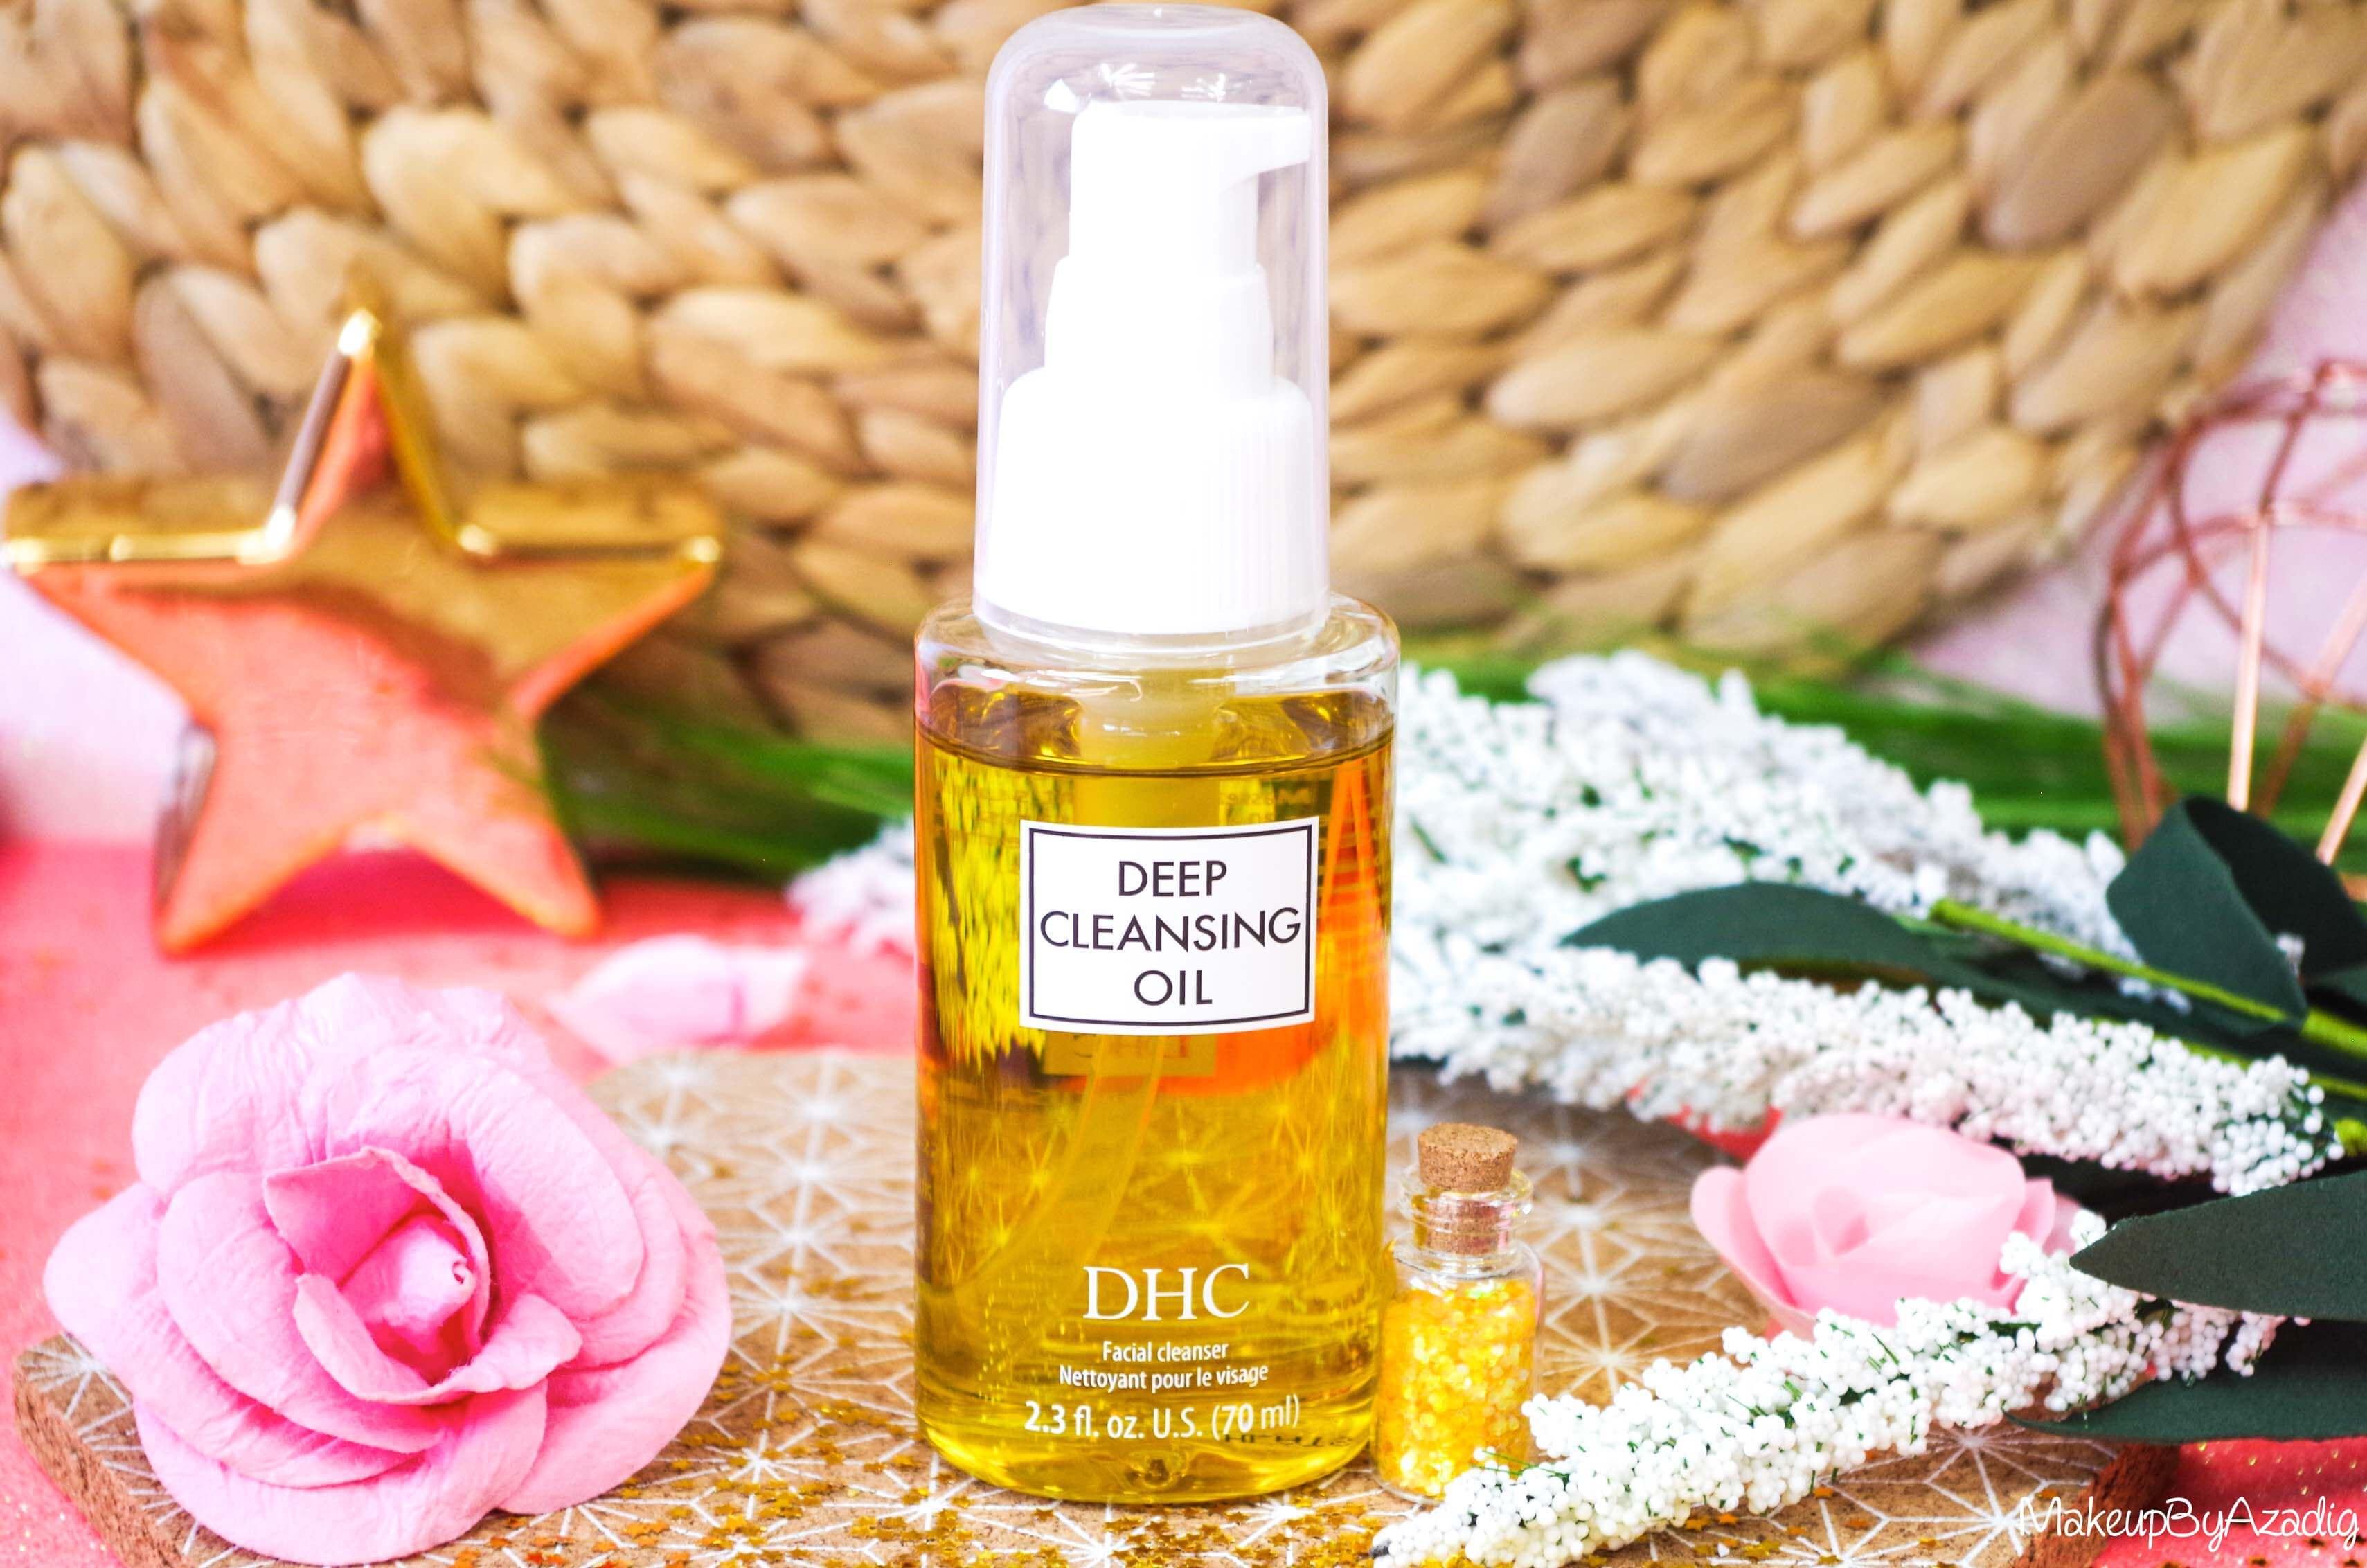 revue-review-huile-demaquillante-deep-cleansing-oil-dhc-meilleure-avis-prix-nocibe-monoprix-makeupbyazadig-best